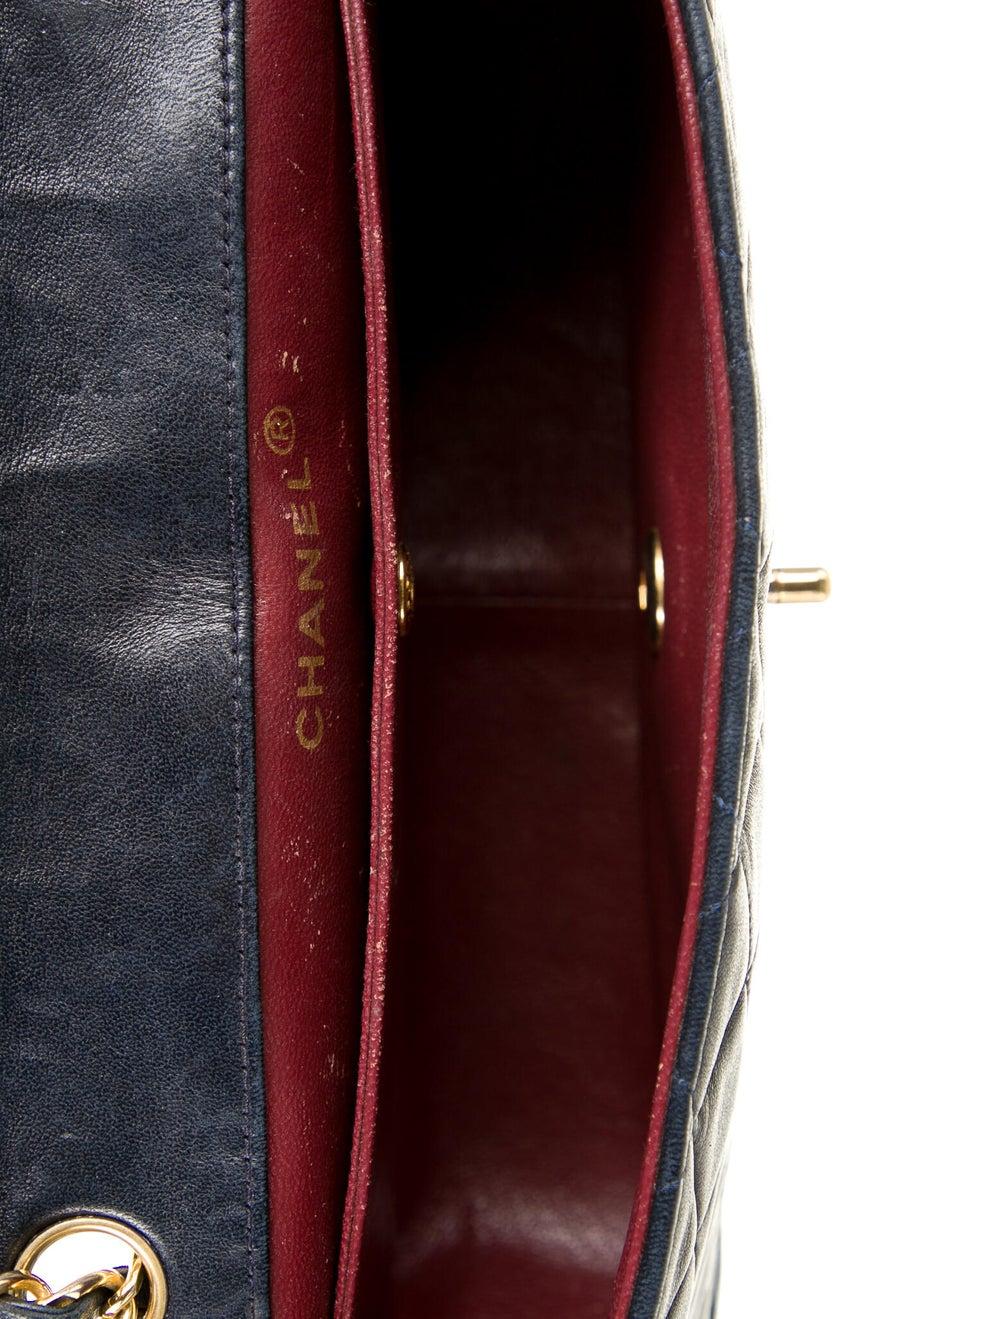 Chanel Vintage Quilted Flap Bag Blue - image 5